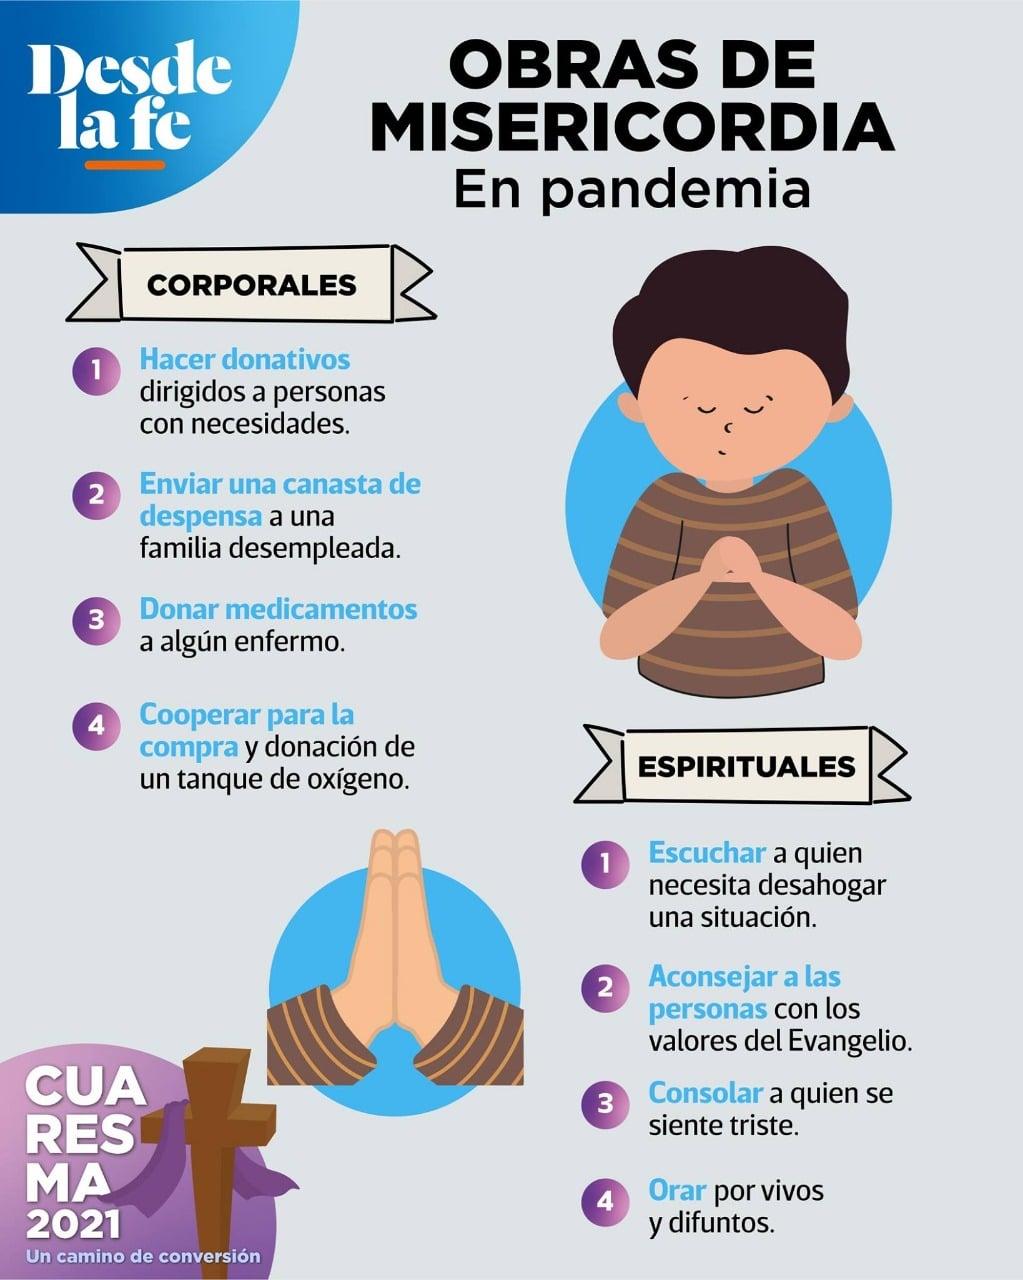 Obras de misericordia en pandemia.